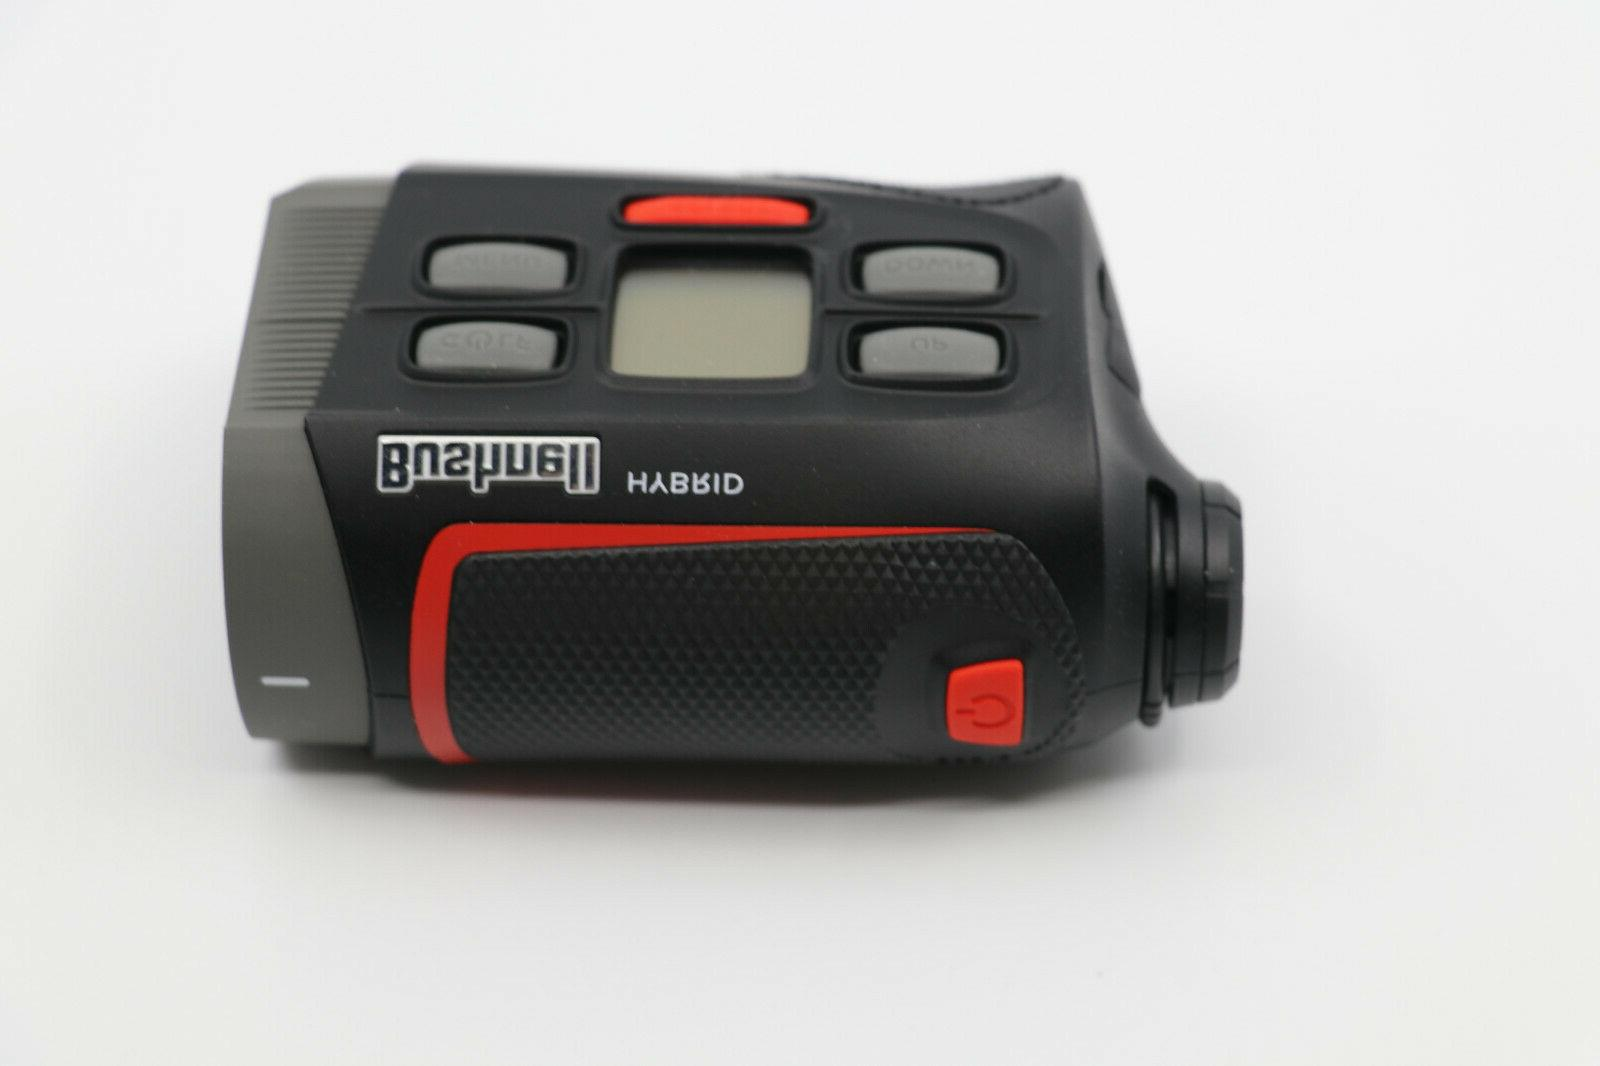 Bushnell Hybrid Laser + Golf